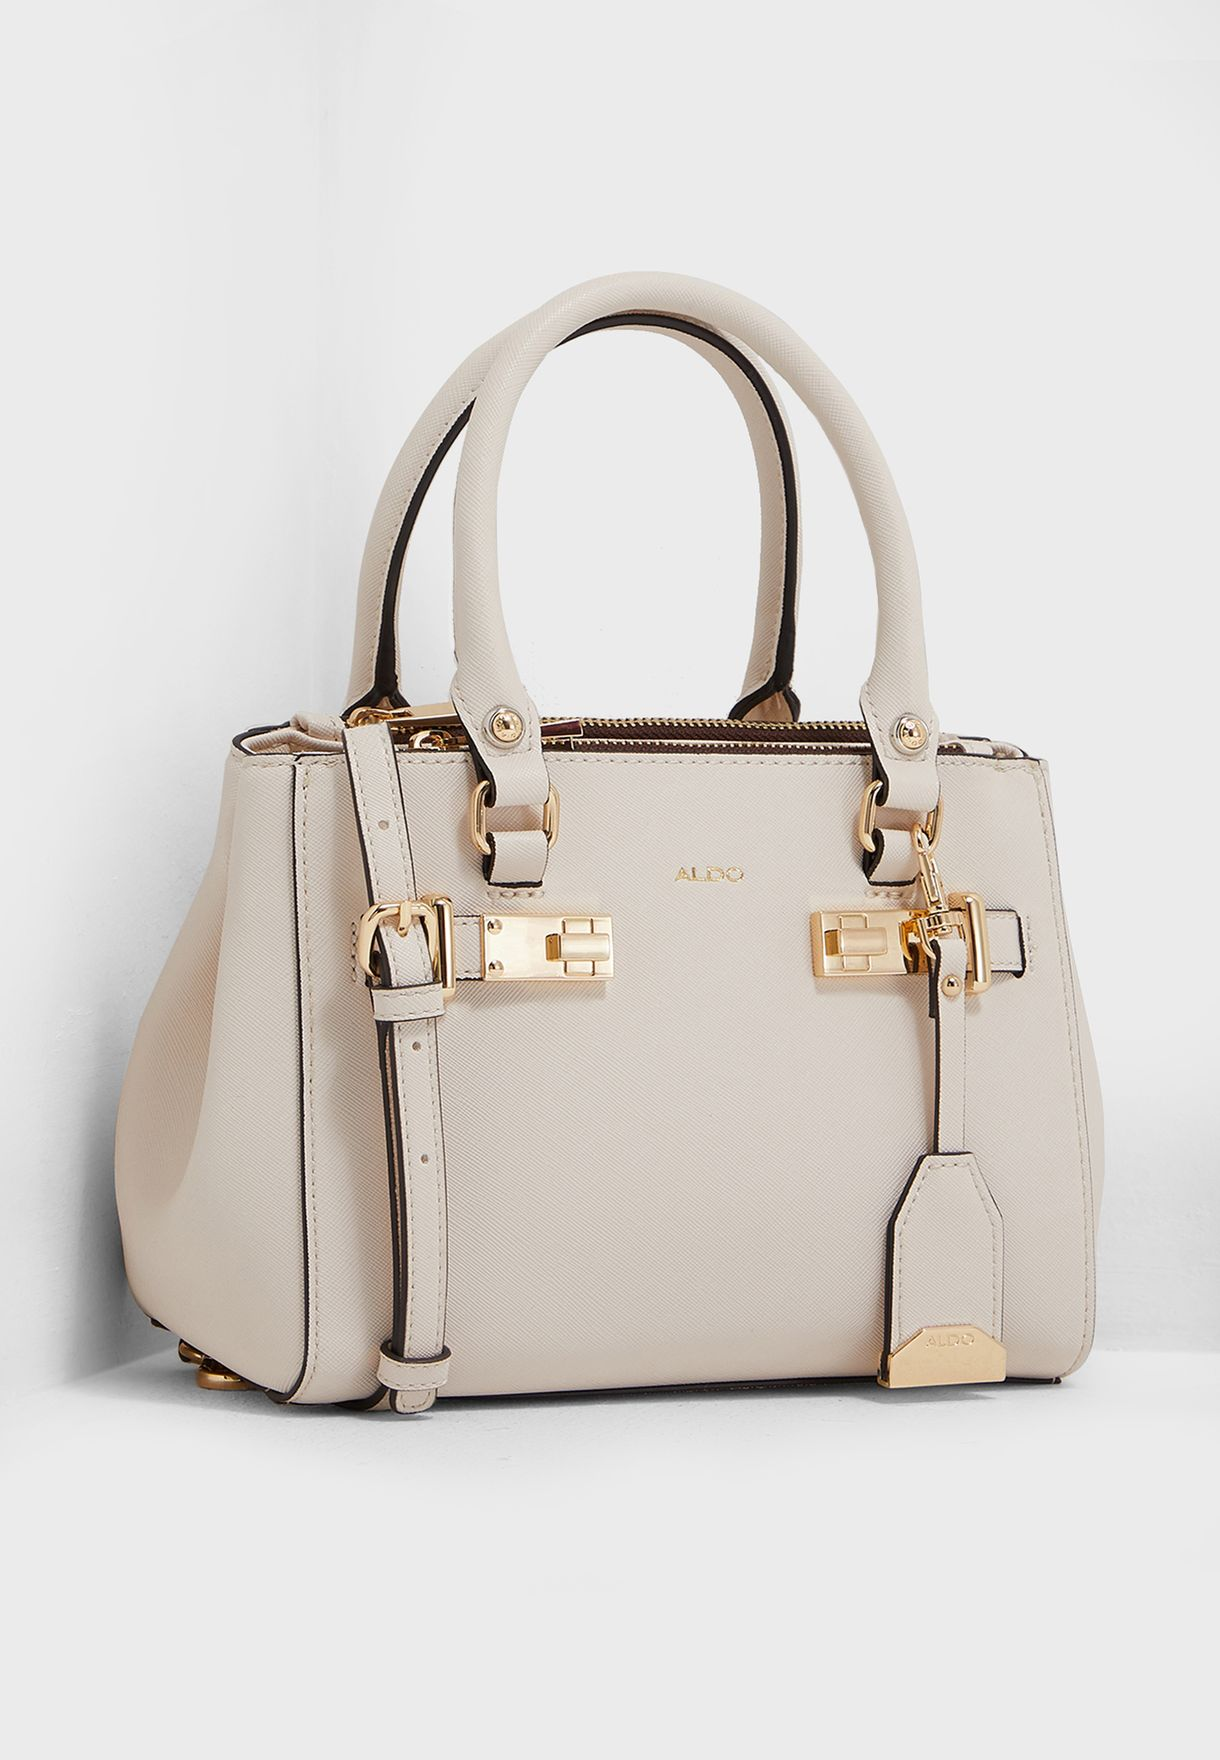 877fc0458bc Shop Aldo white Balswan Mini Satchel BALSWAN32 for Women in UAE ...